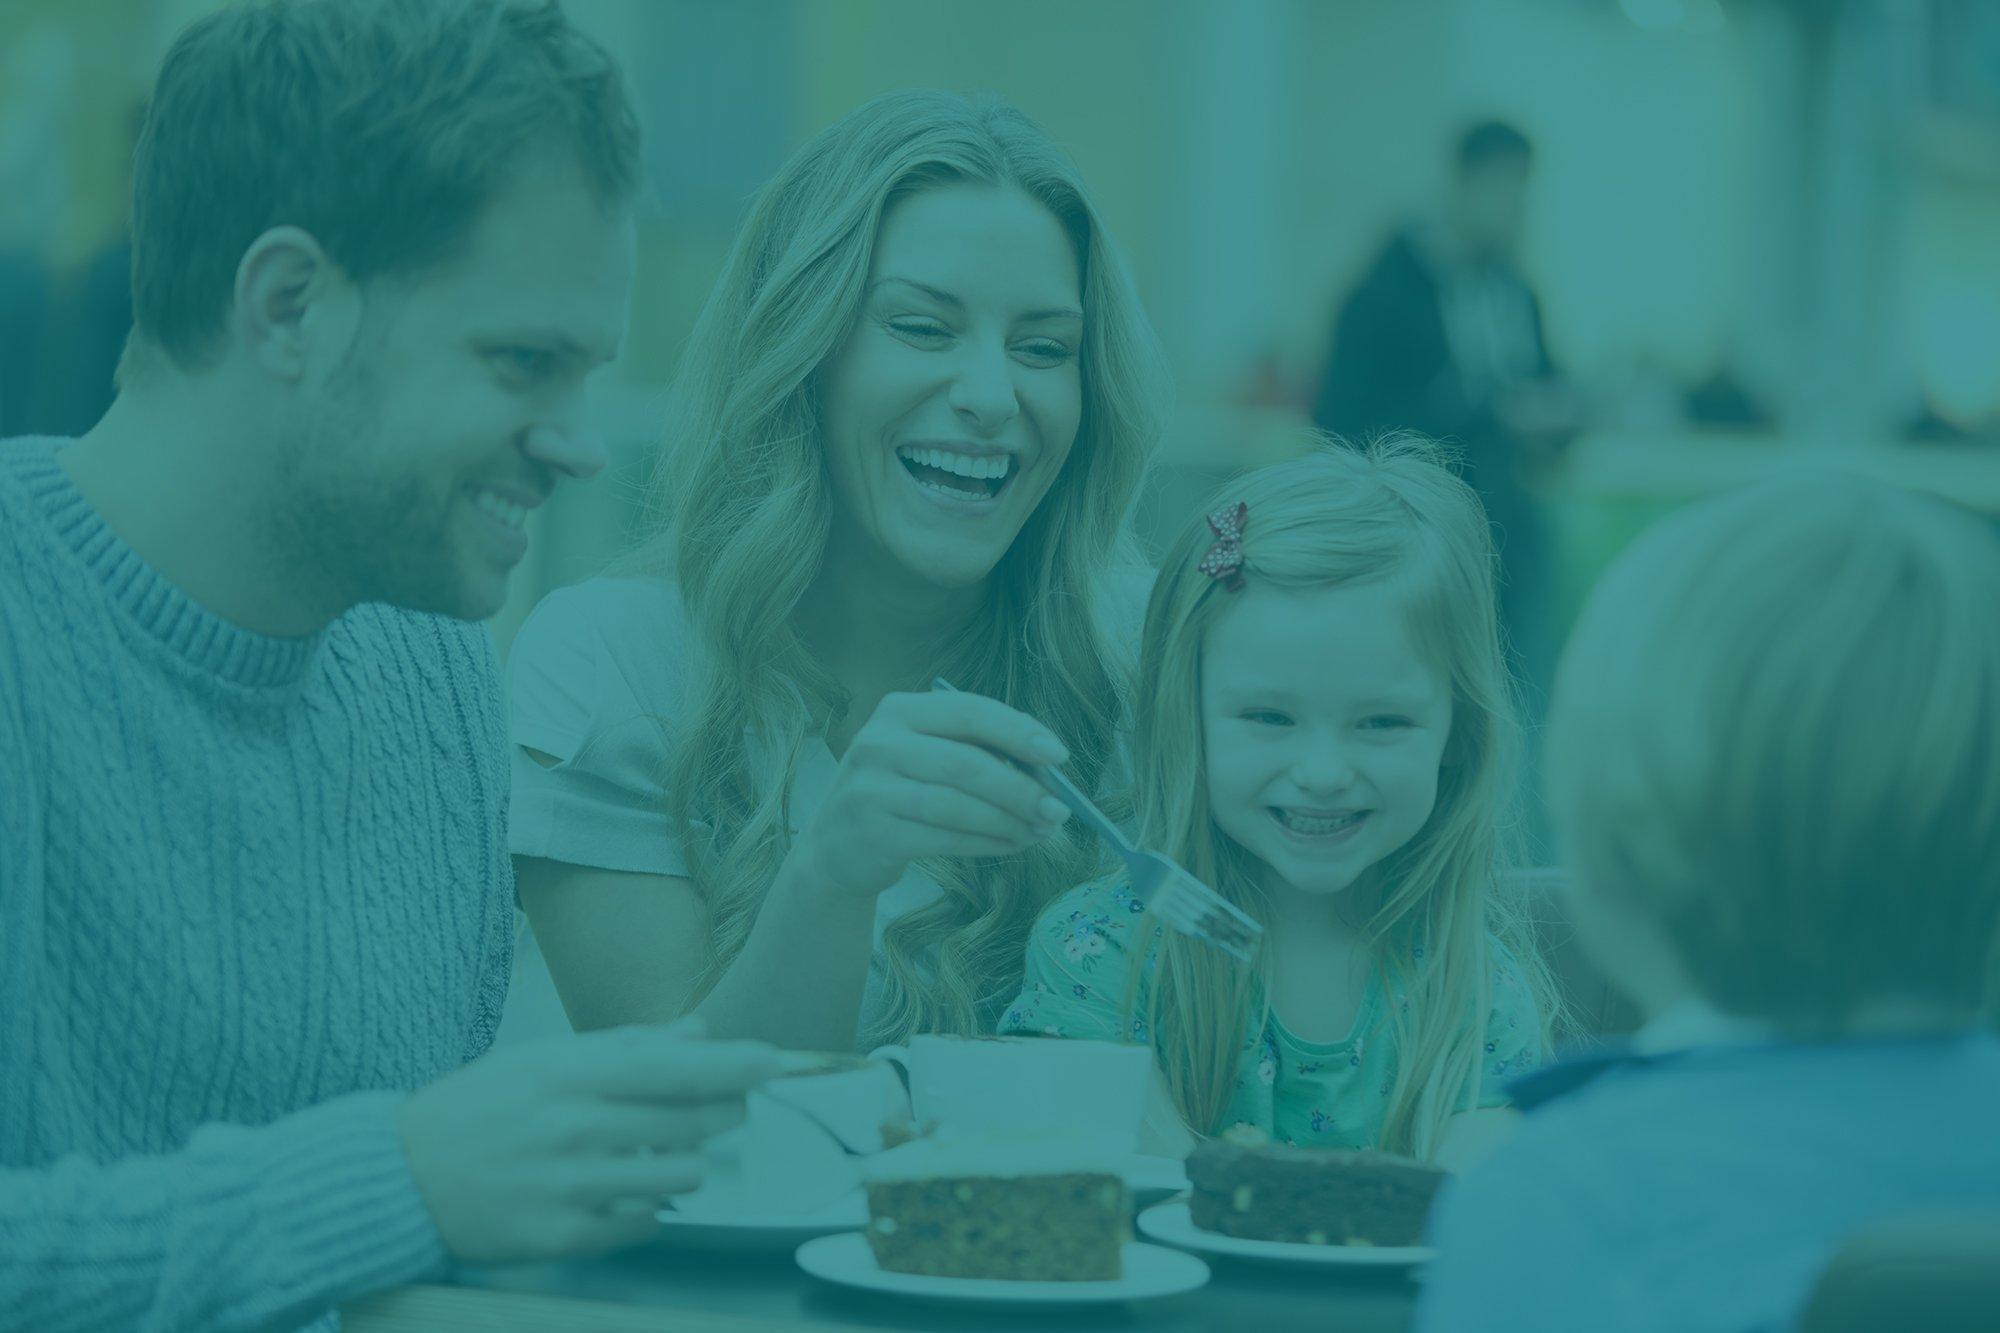 Family laughing over dessert - Parkcrest Dental Group.